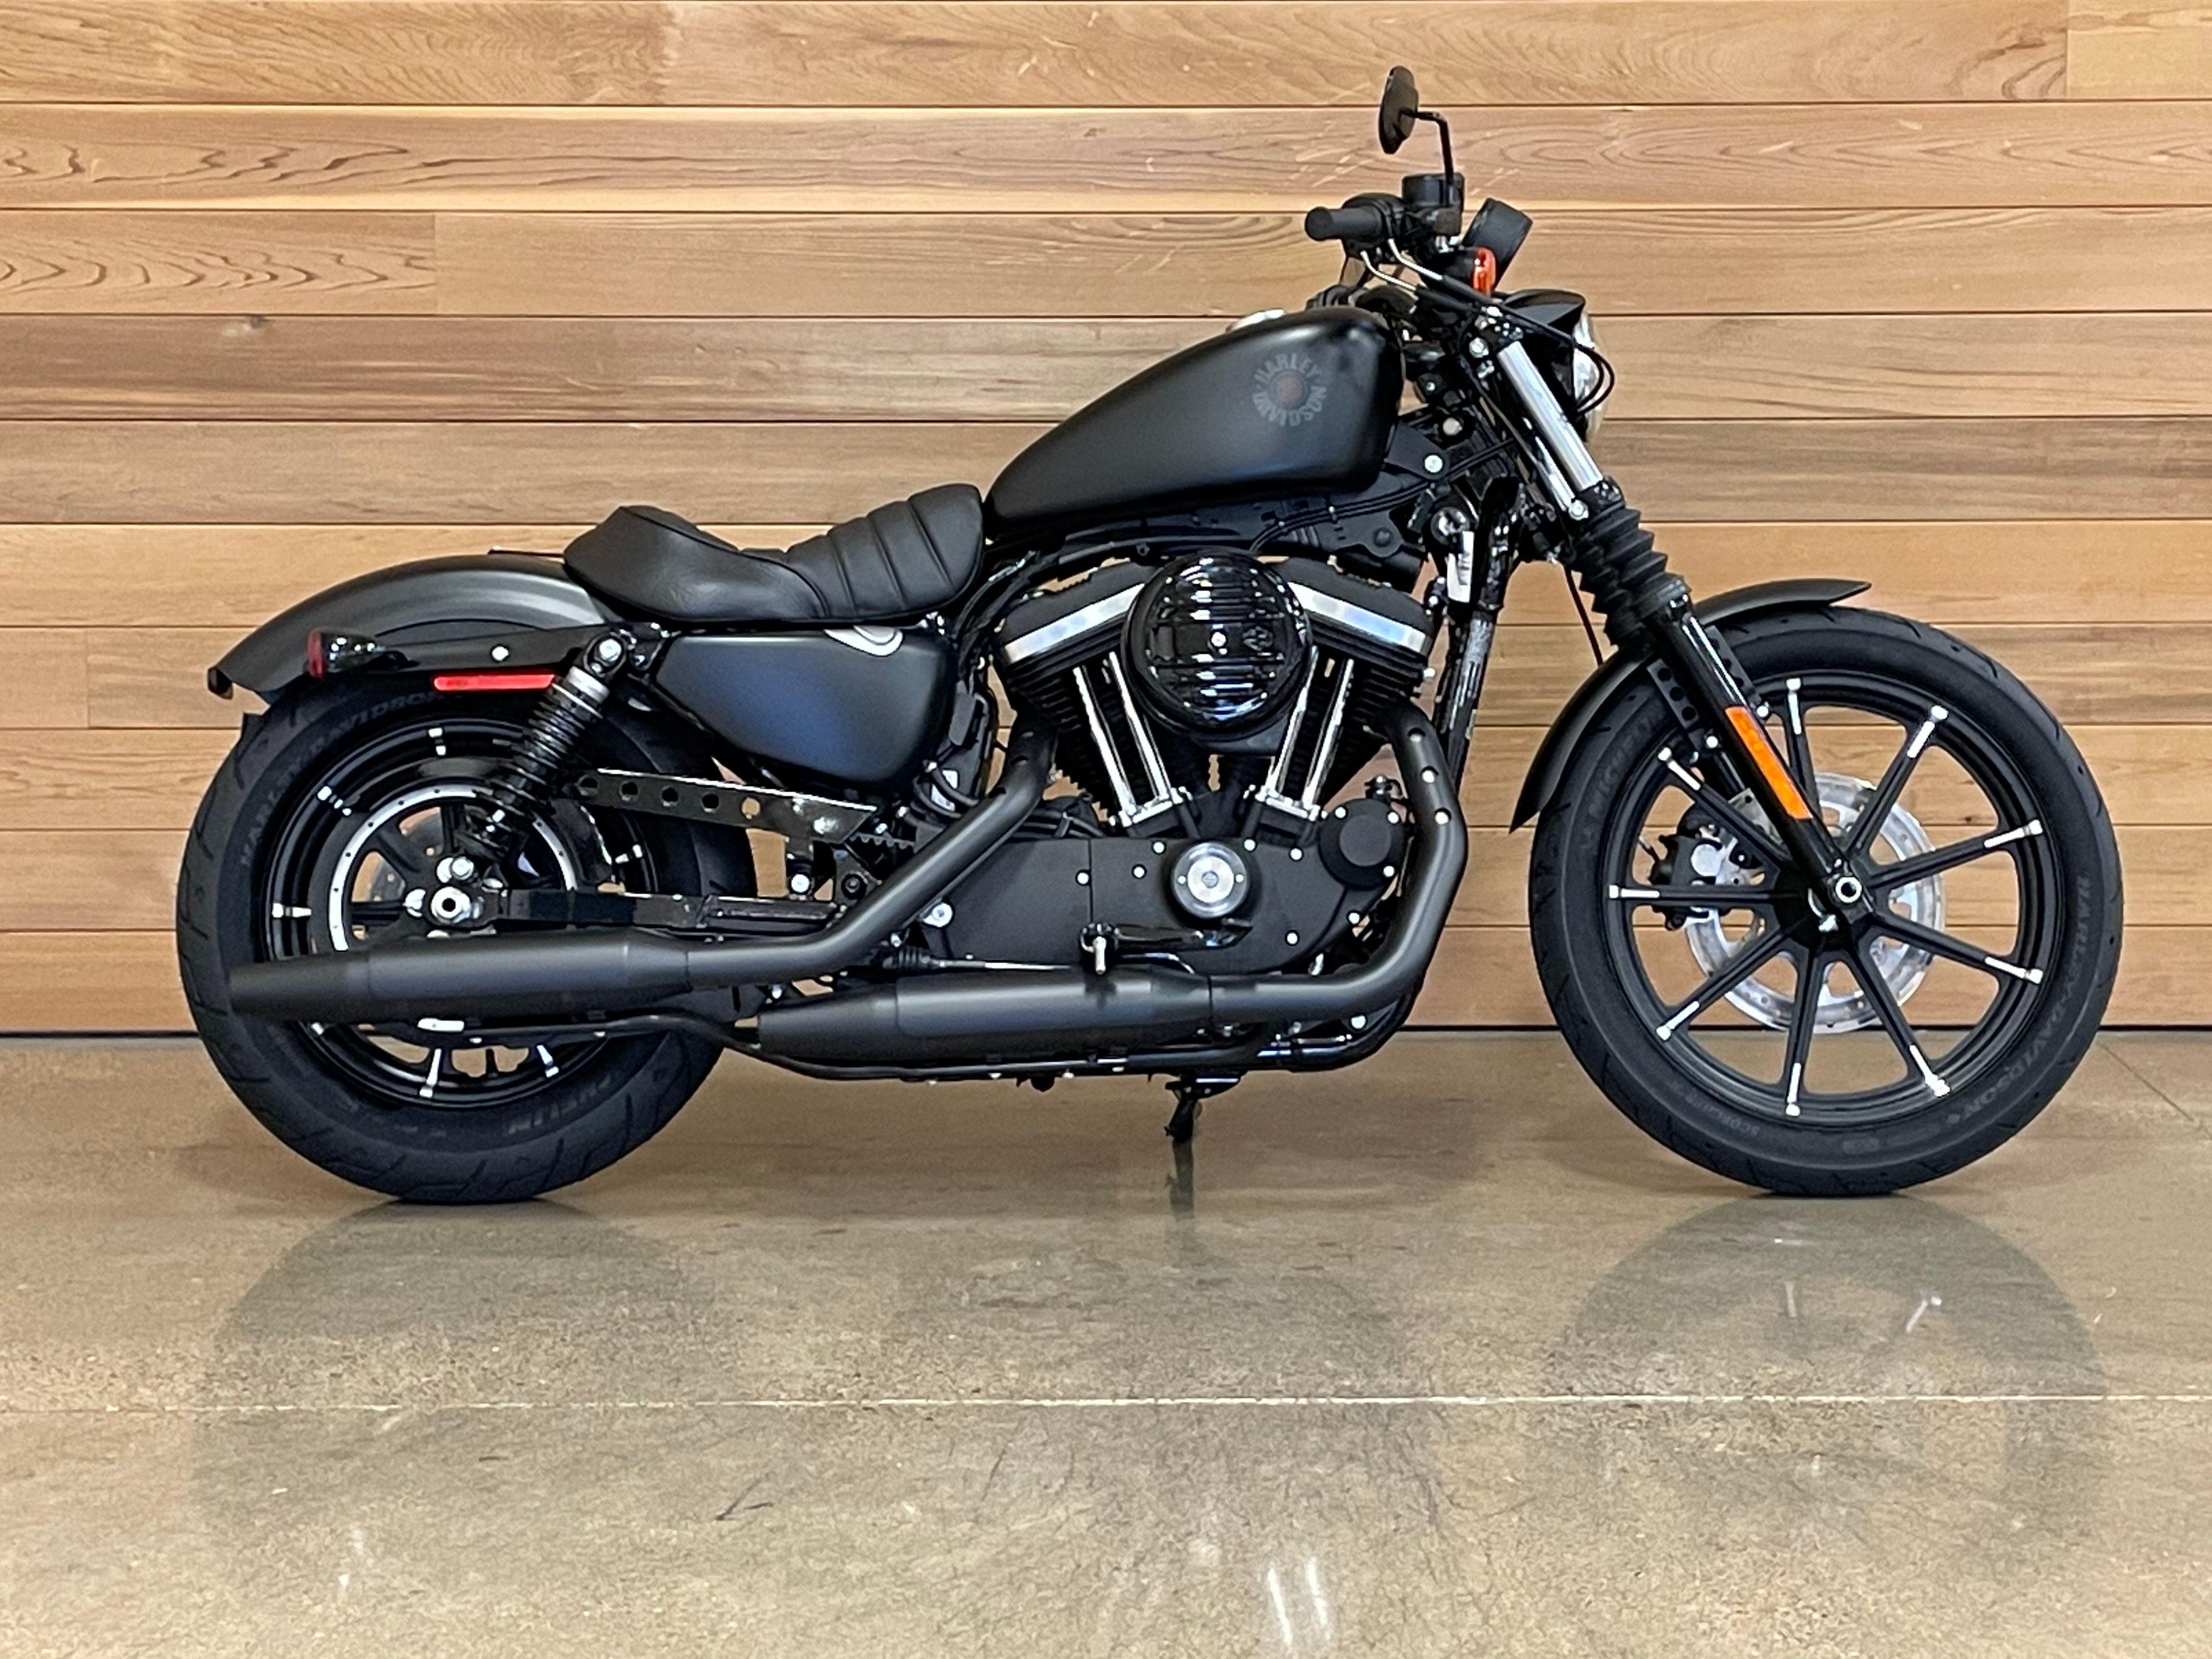 2021 Harley-Davidson XL883N